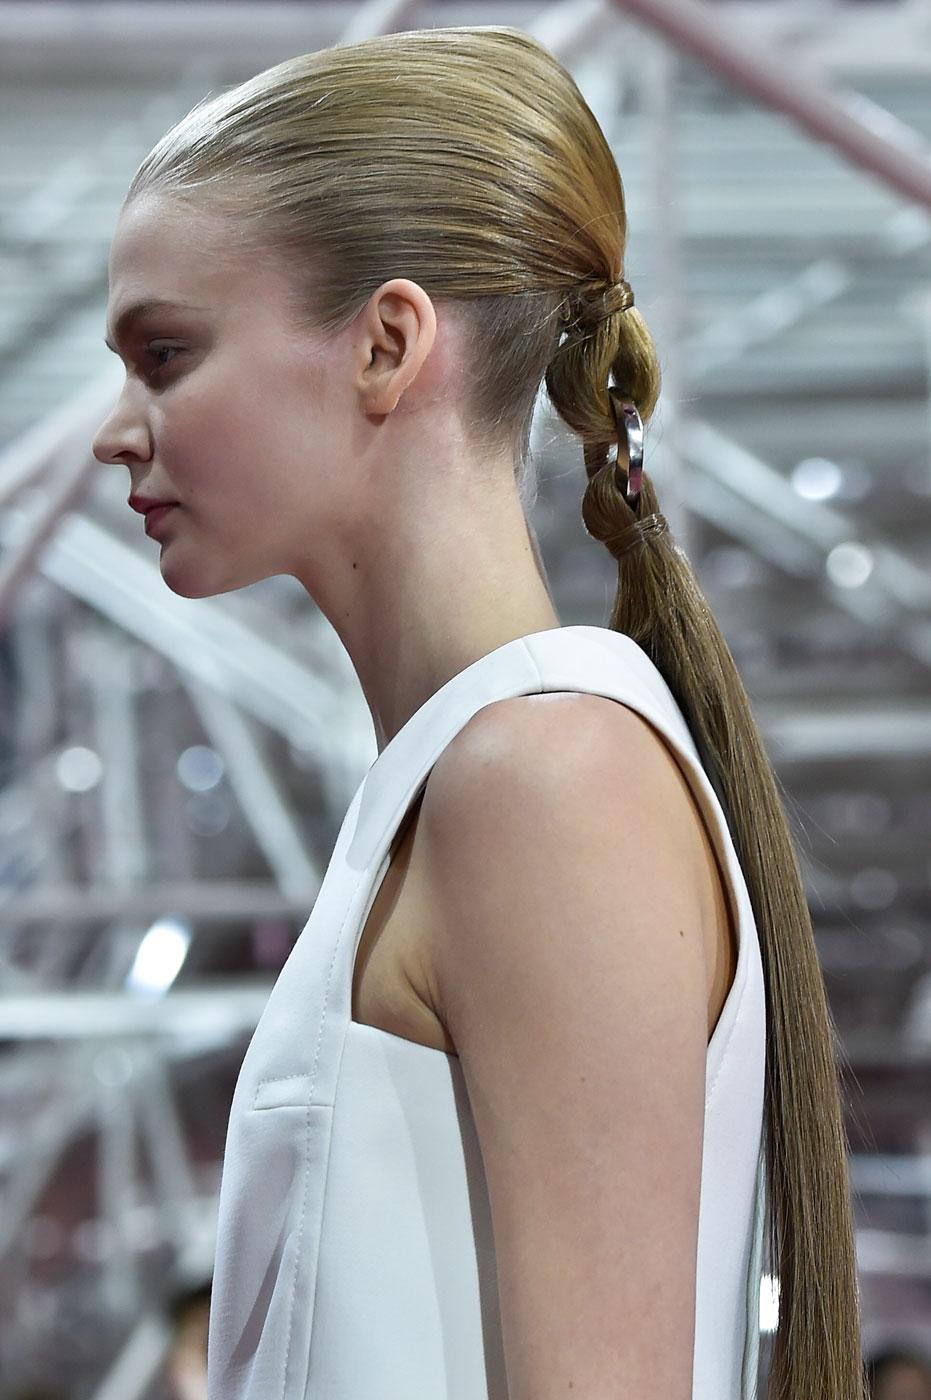 Christian-Dior-fashion-runway-show-close-ups-haute-couture-paris-spring-summer-2015-the-impression-182